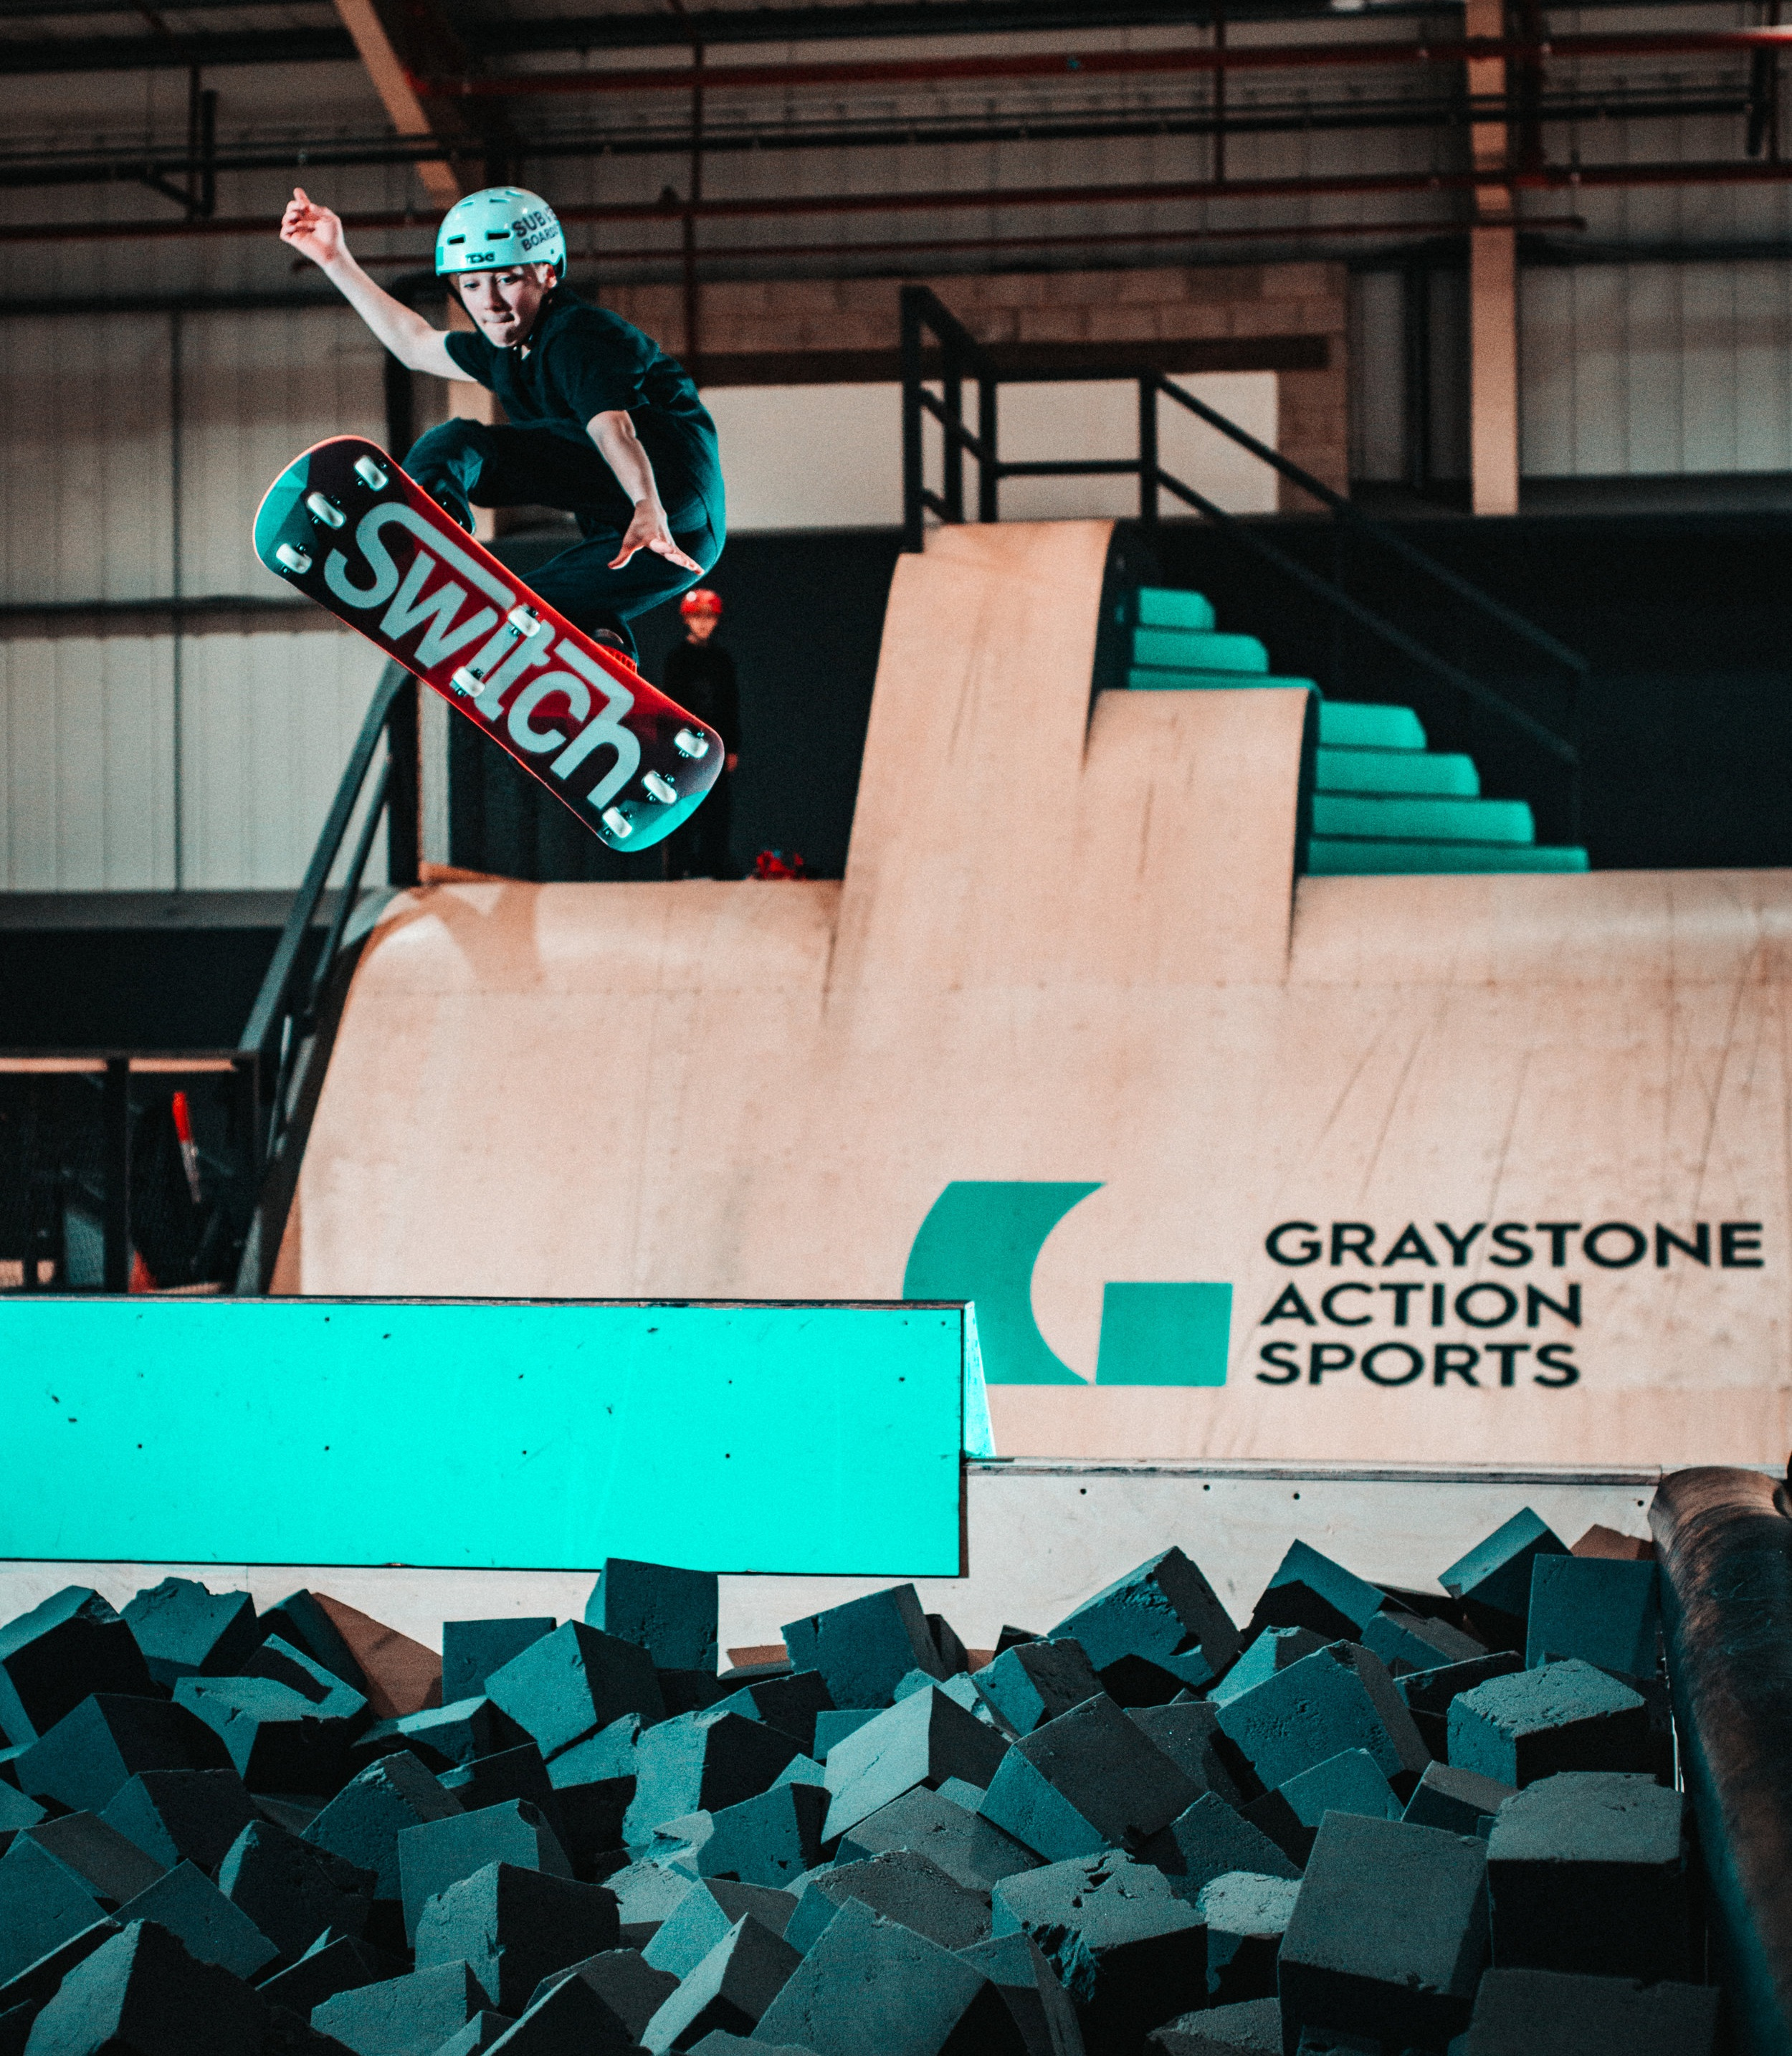 Graystone-OWENPETERSPHOTOGRAPHY-0300.jpg